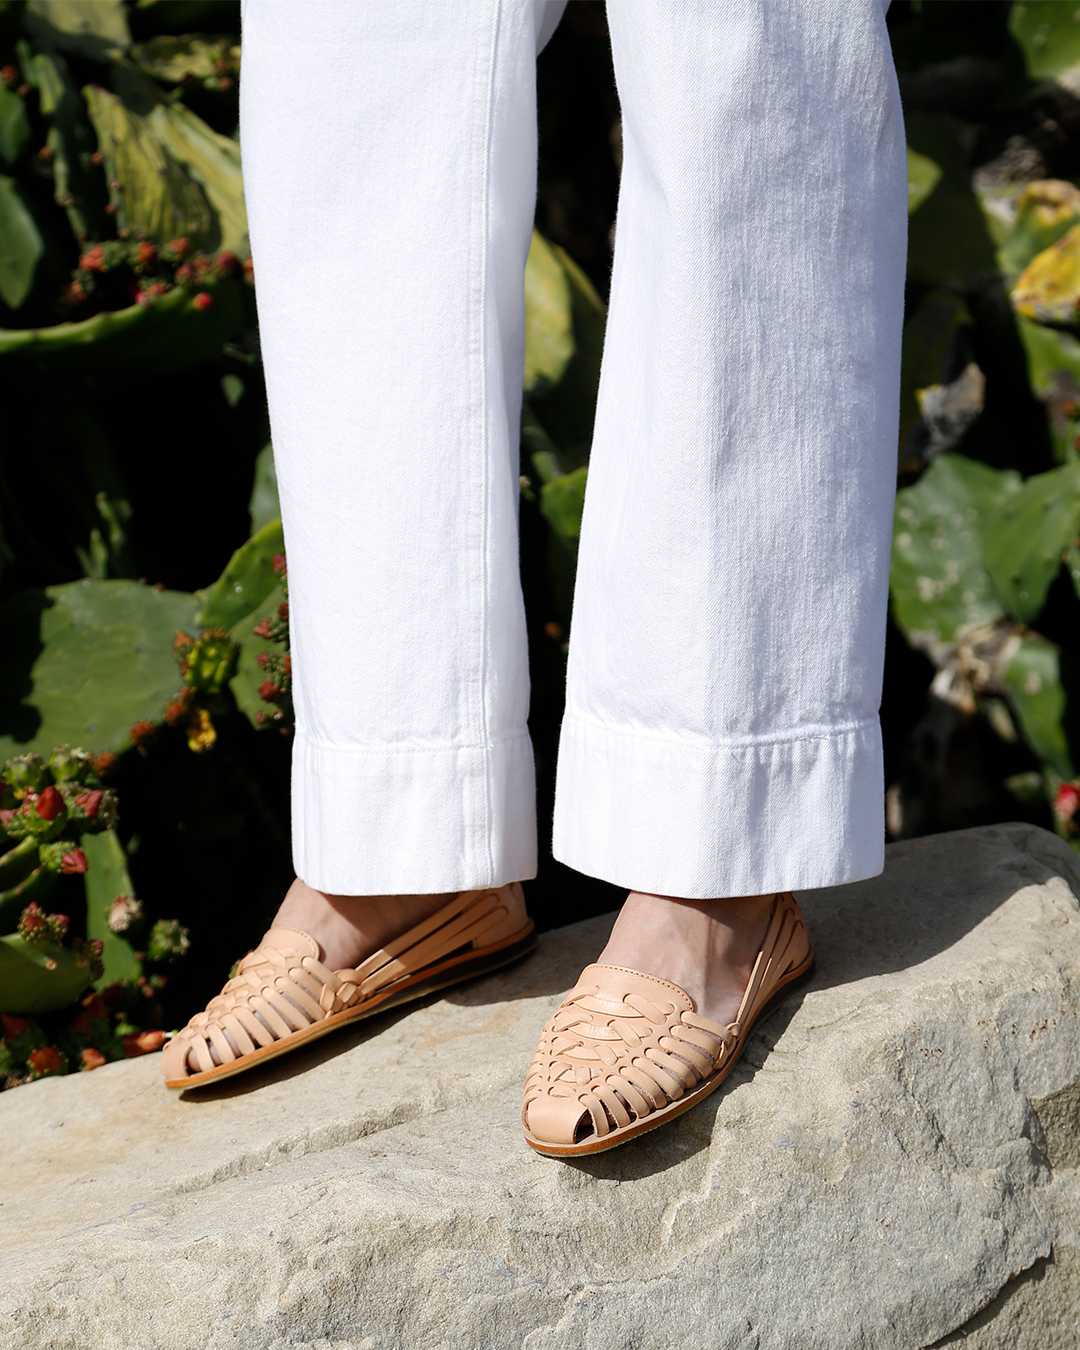 a6fe0977c1d2 Nisolo Women s Ecuador Huarache Sandal Natural